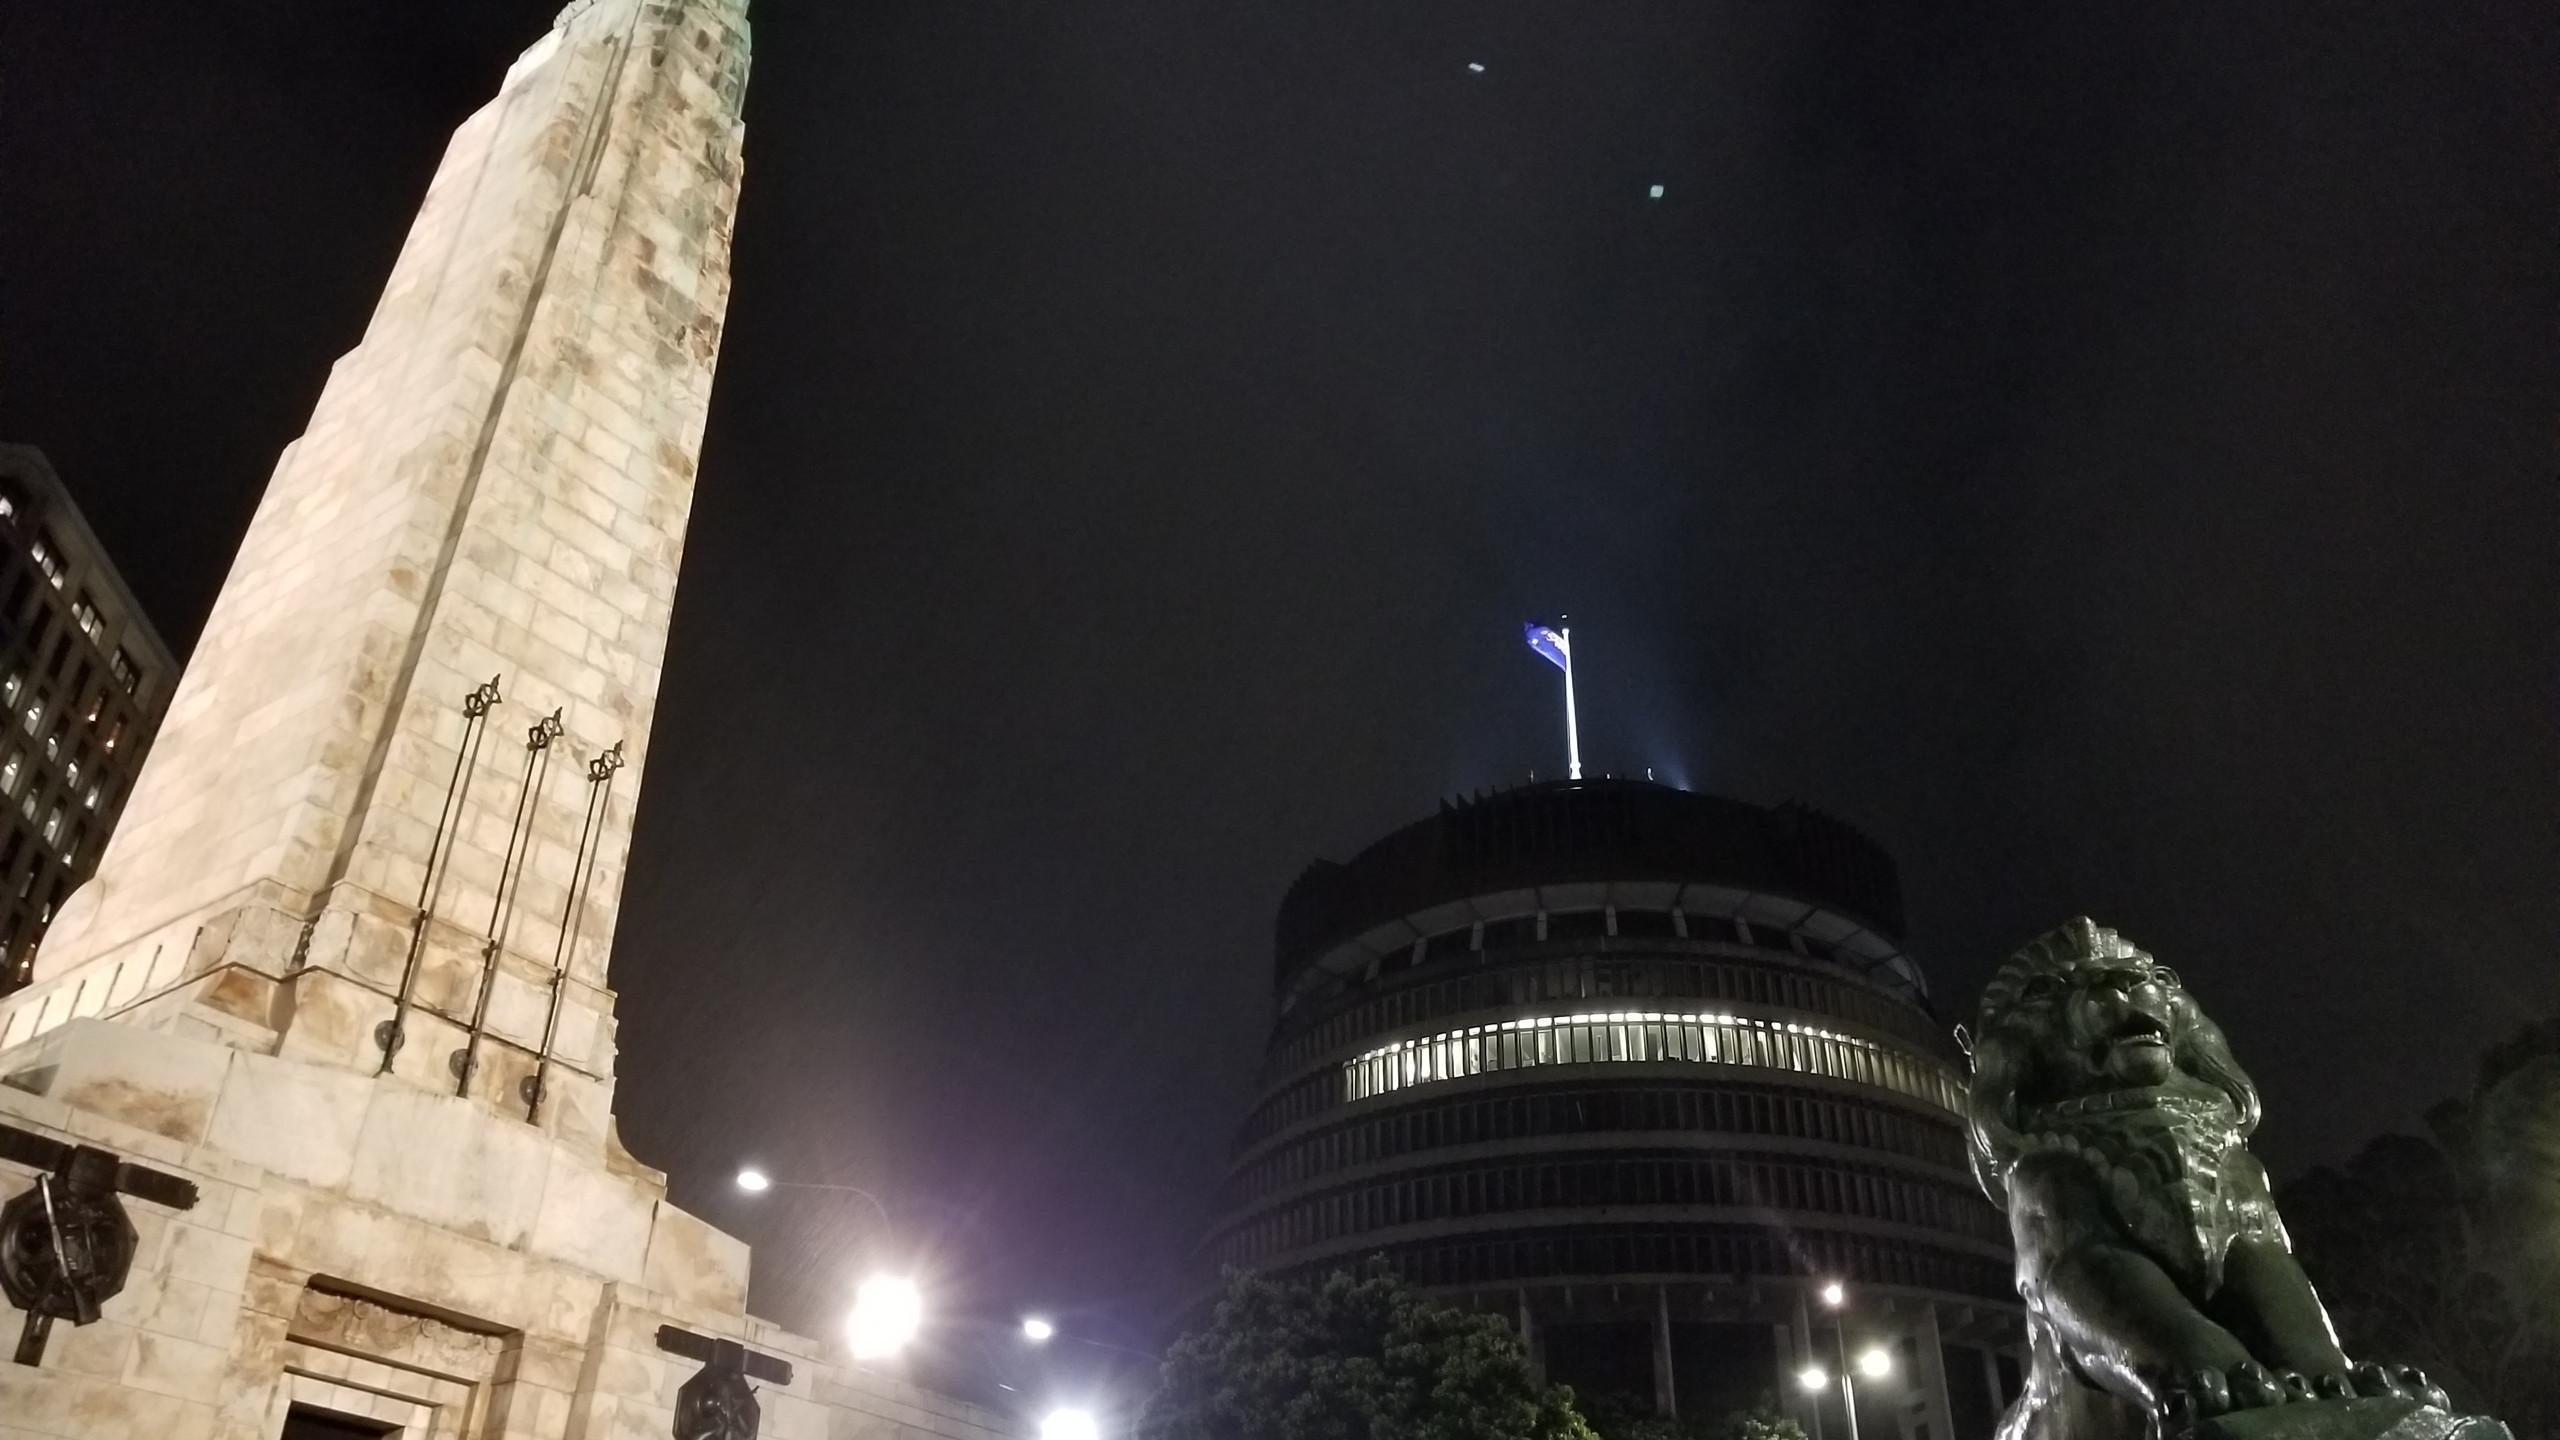 Wellington parliament, New Zealand activities, tours of New Zealand